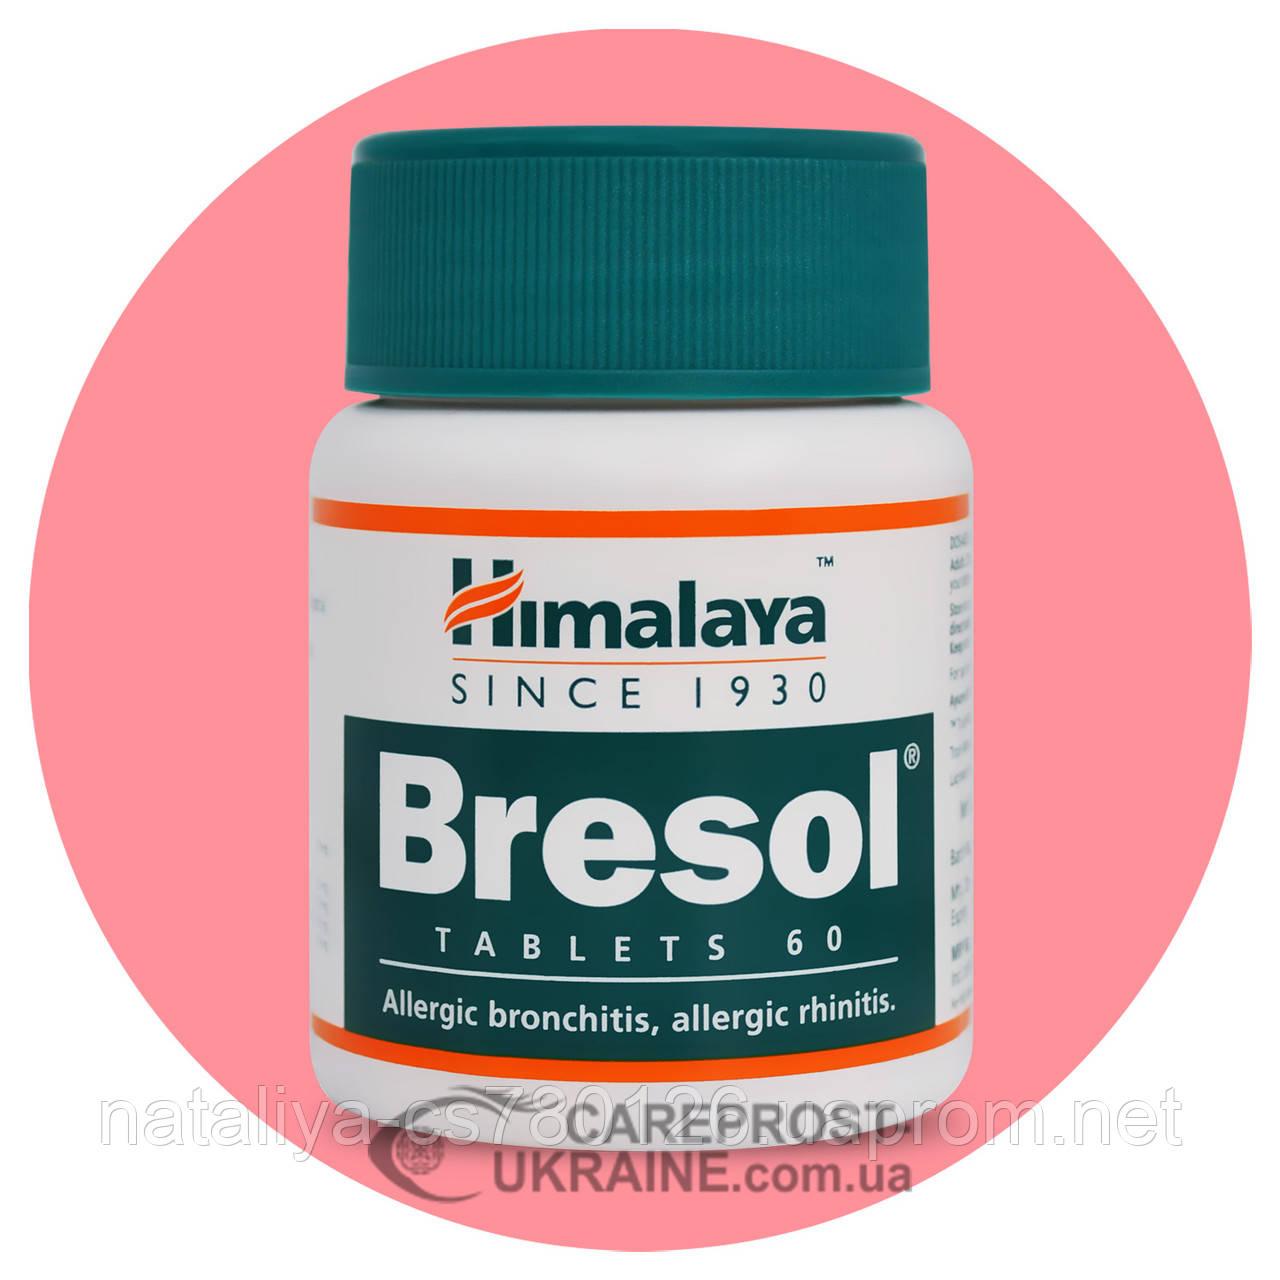 Бресол Хималая (Bresol Tablets Himalaya),  60 таб.